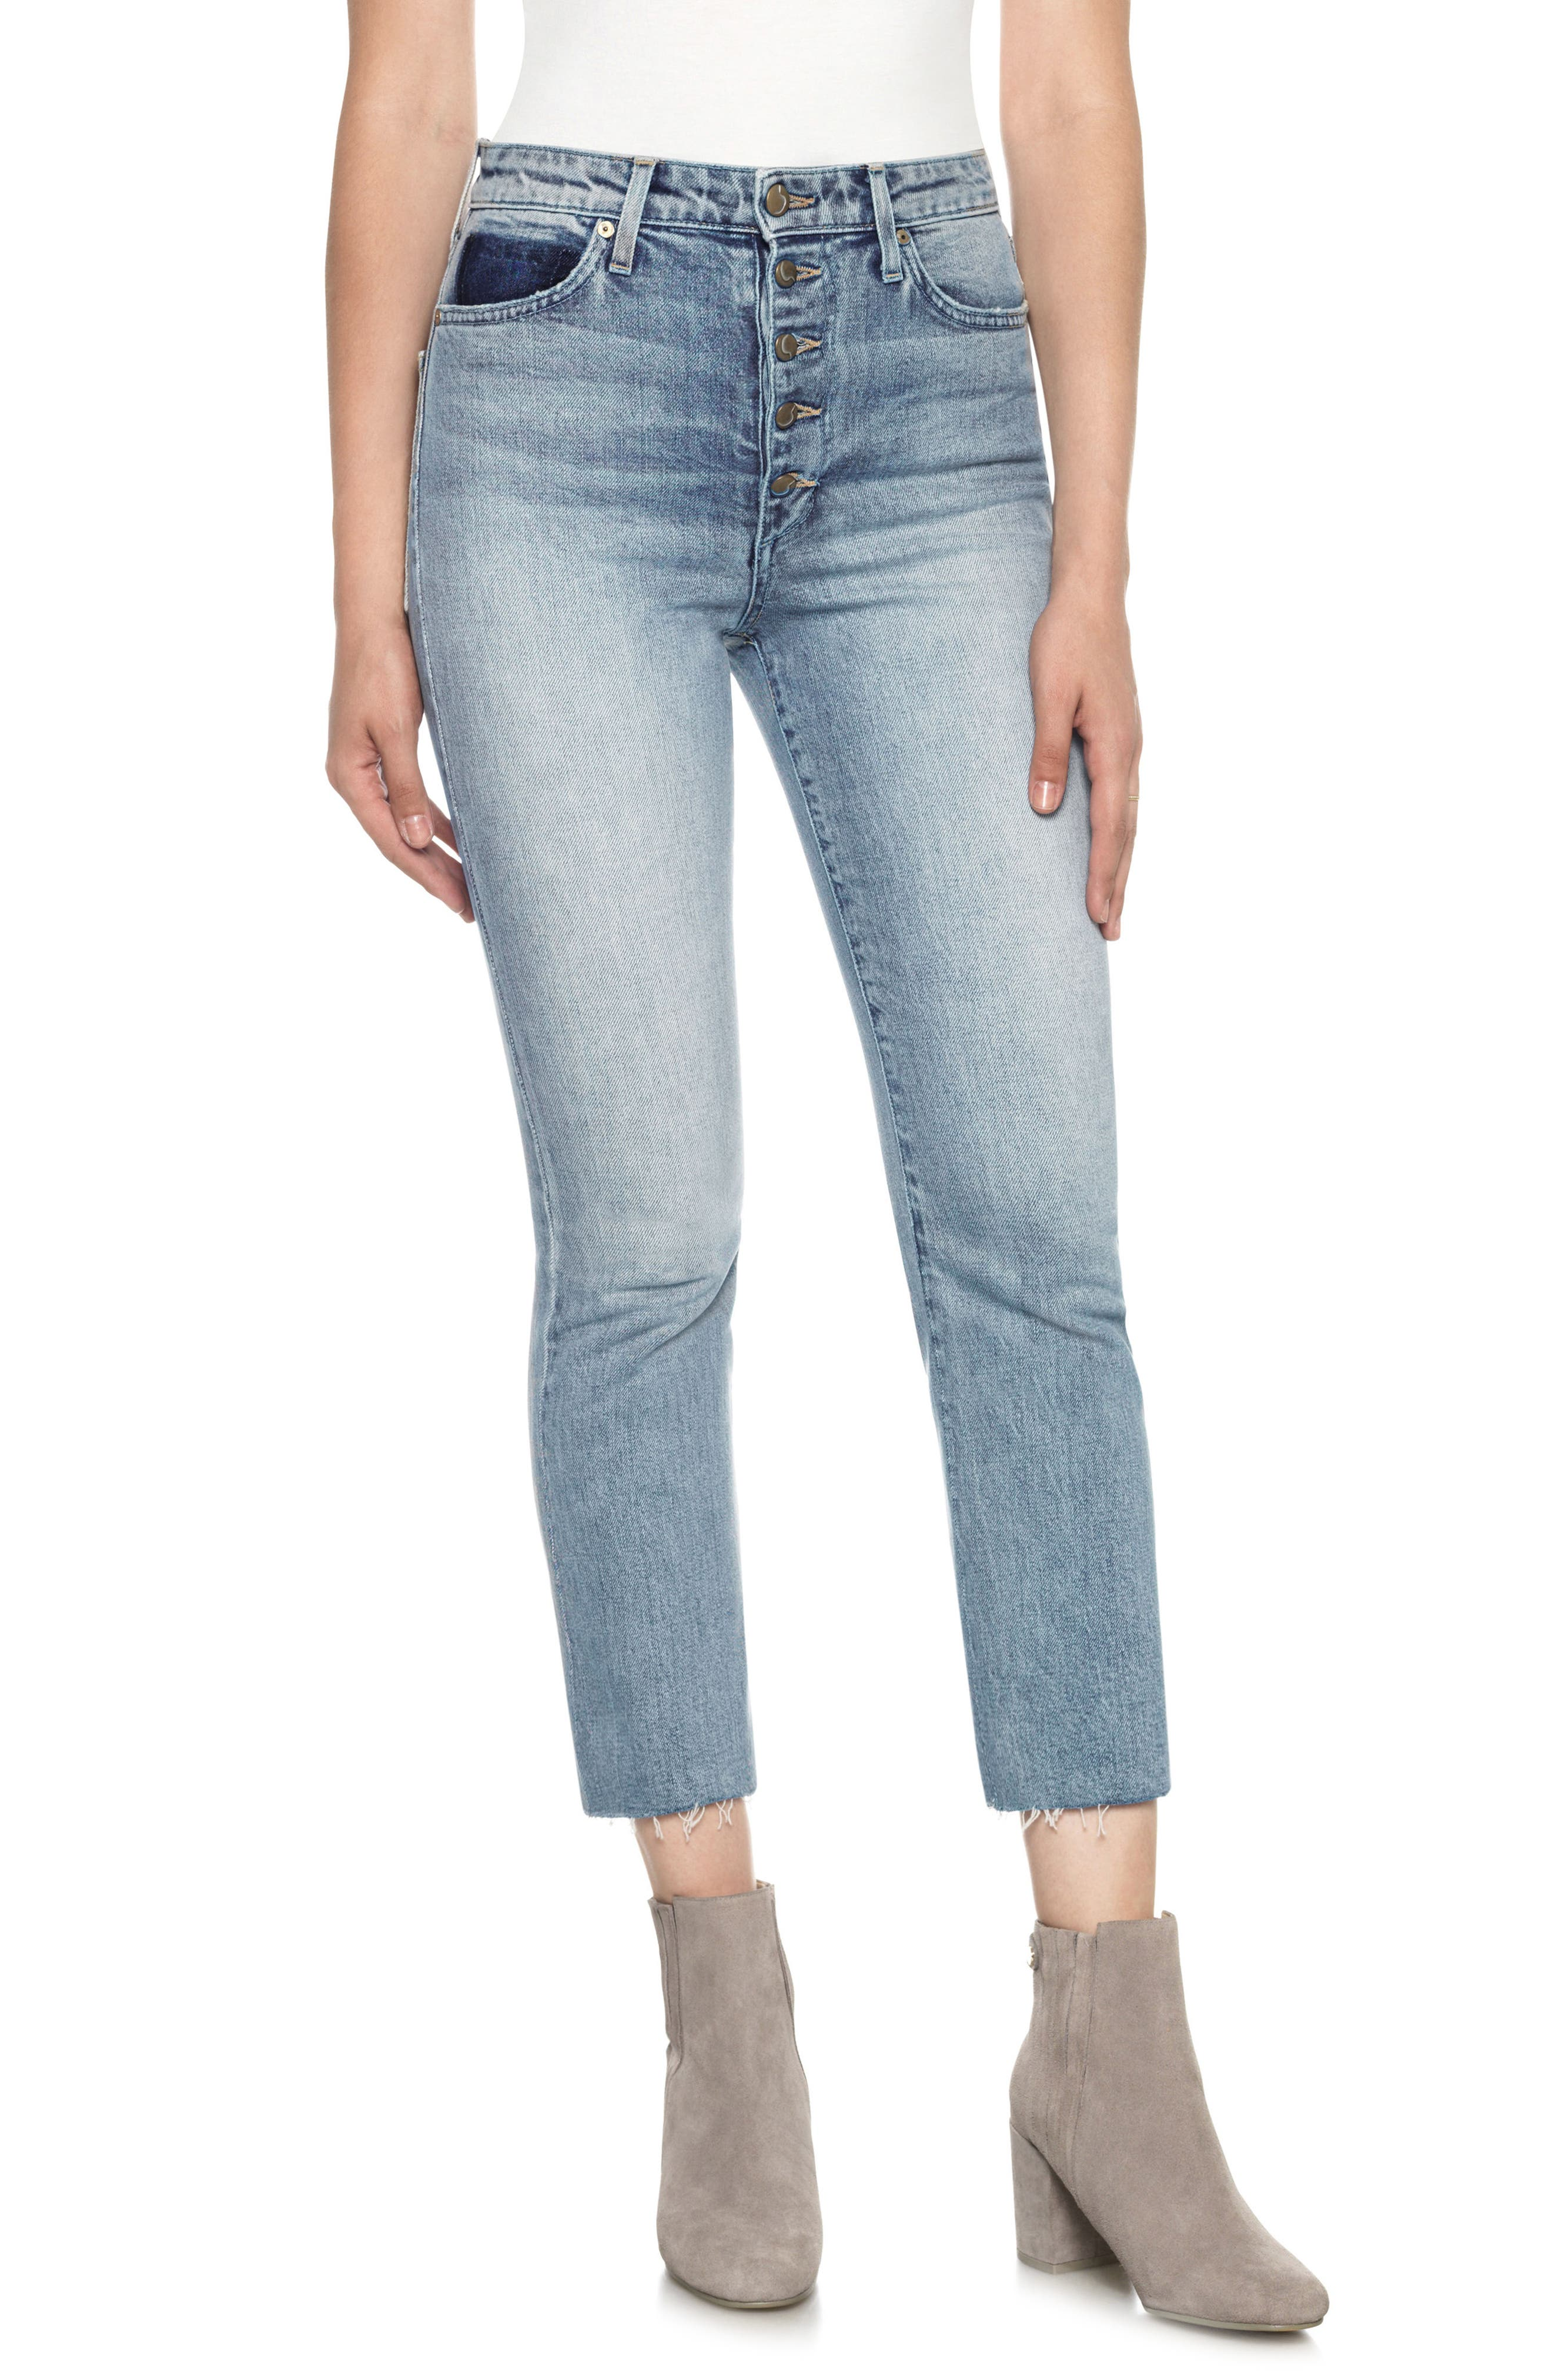 Debbie High Waist Crop Boyfriend Jeans,                         Main,                         color, 411